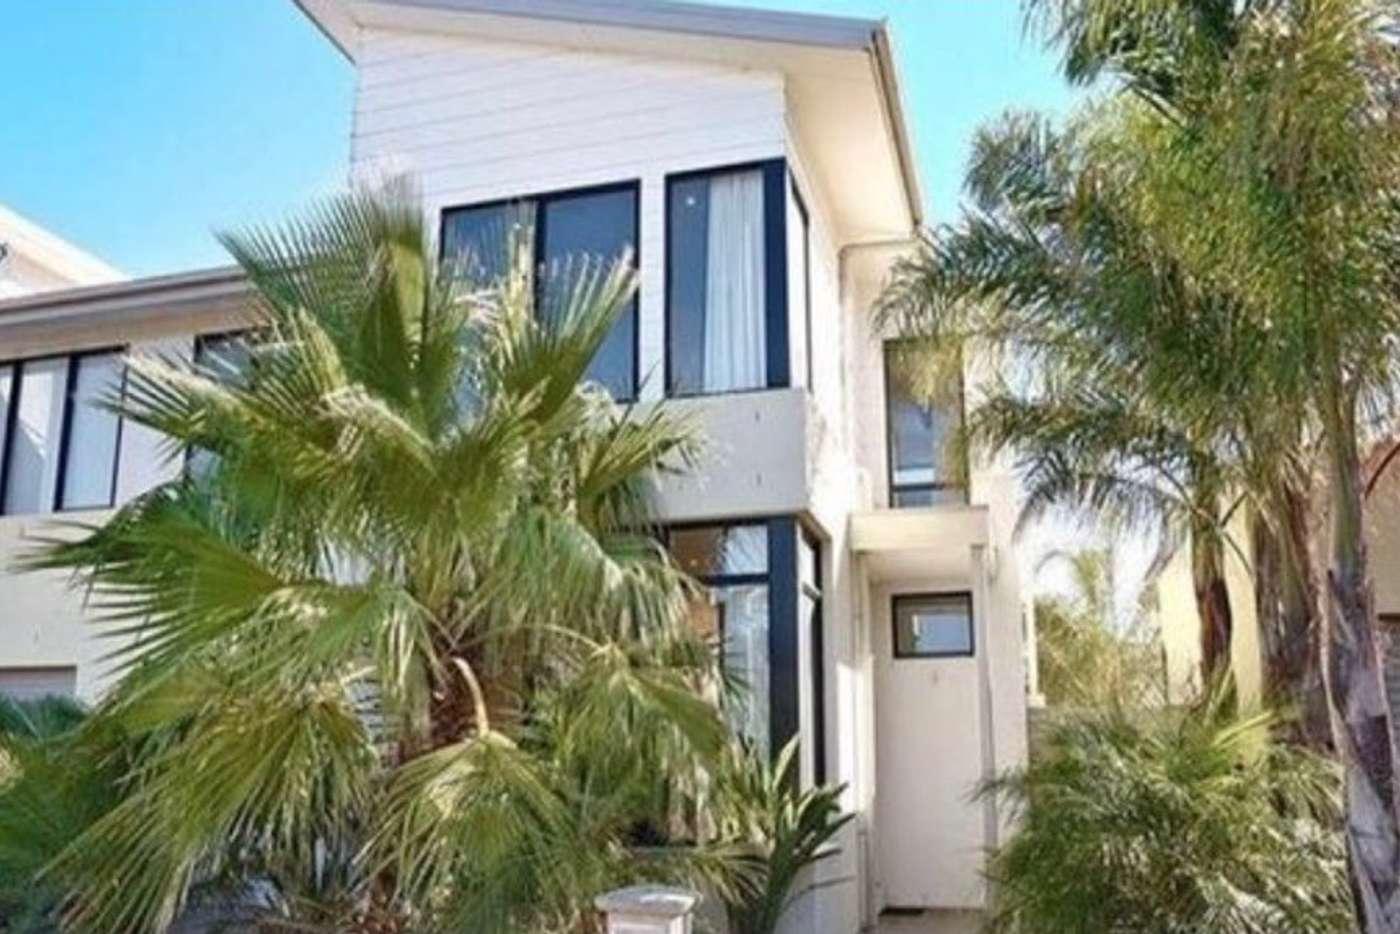 Main view of Homely house listing, 3 Marino Lane, Caroline Springs VIC 3023